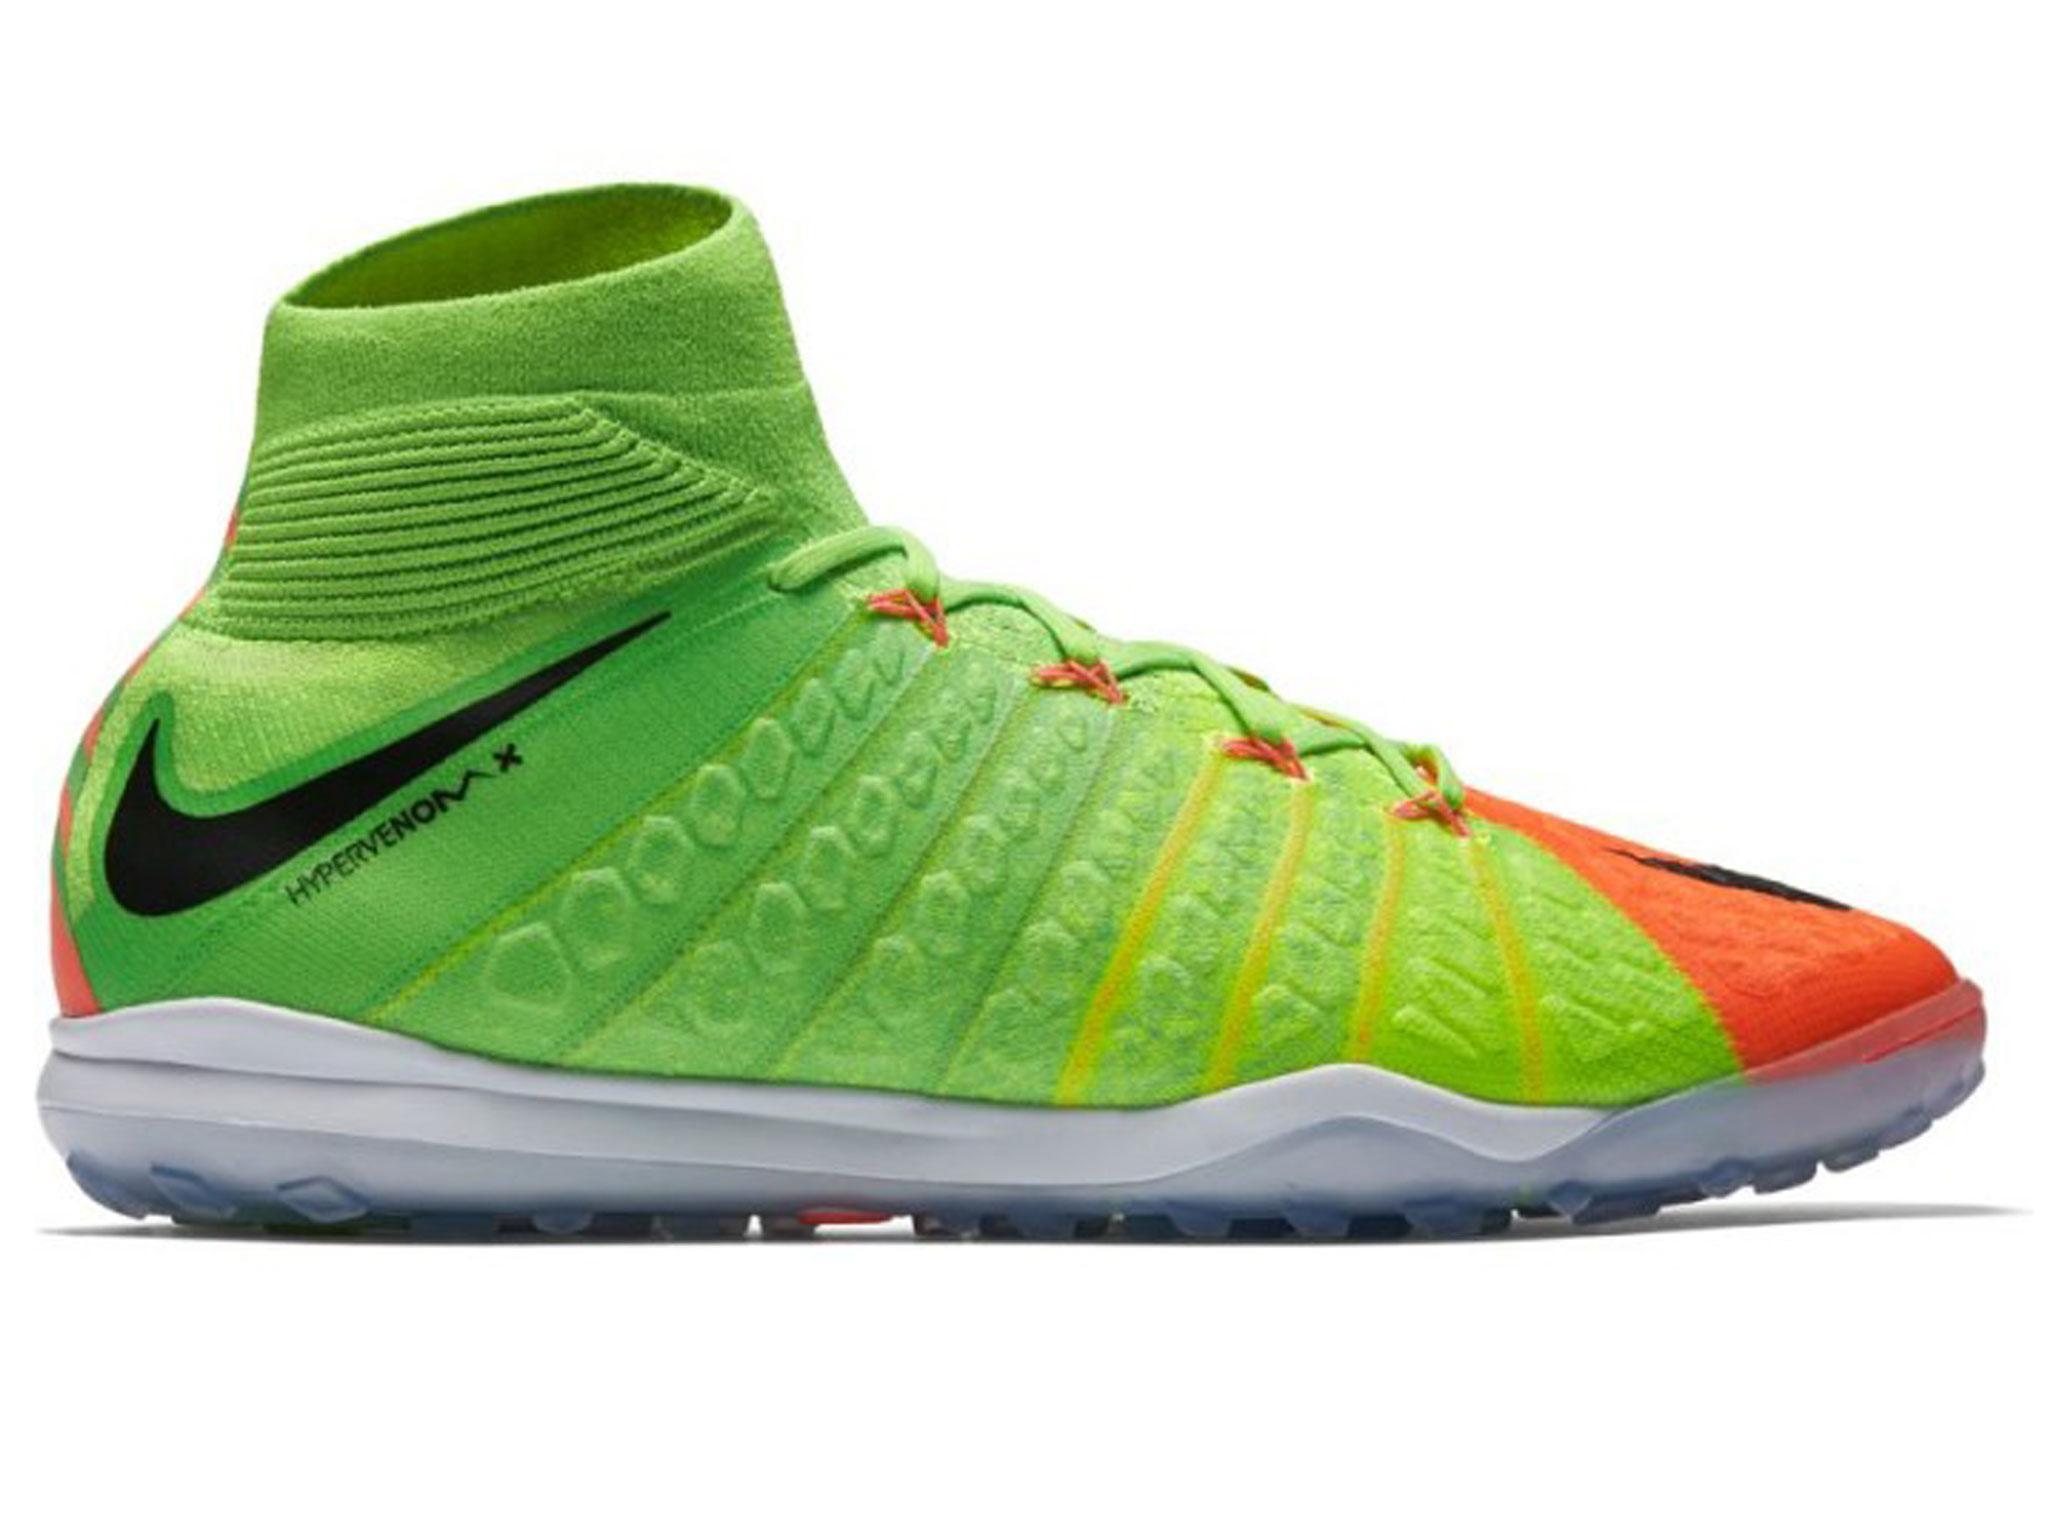 94f732a21 Nike HypervenomX Proximo II Dynamic Fit  £140